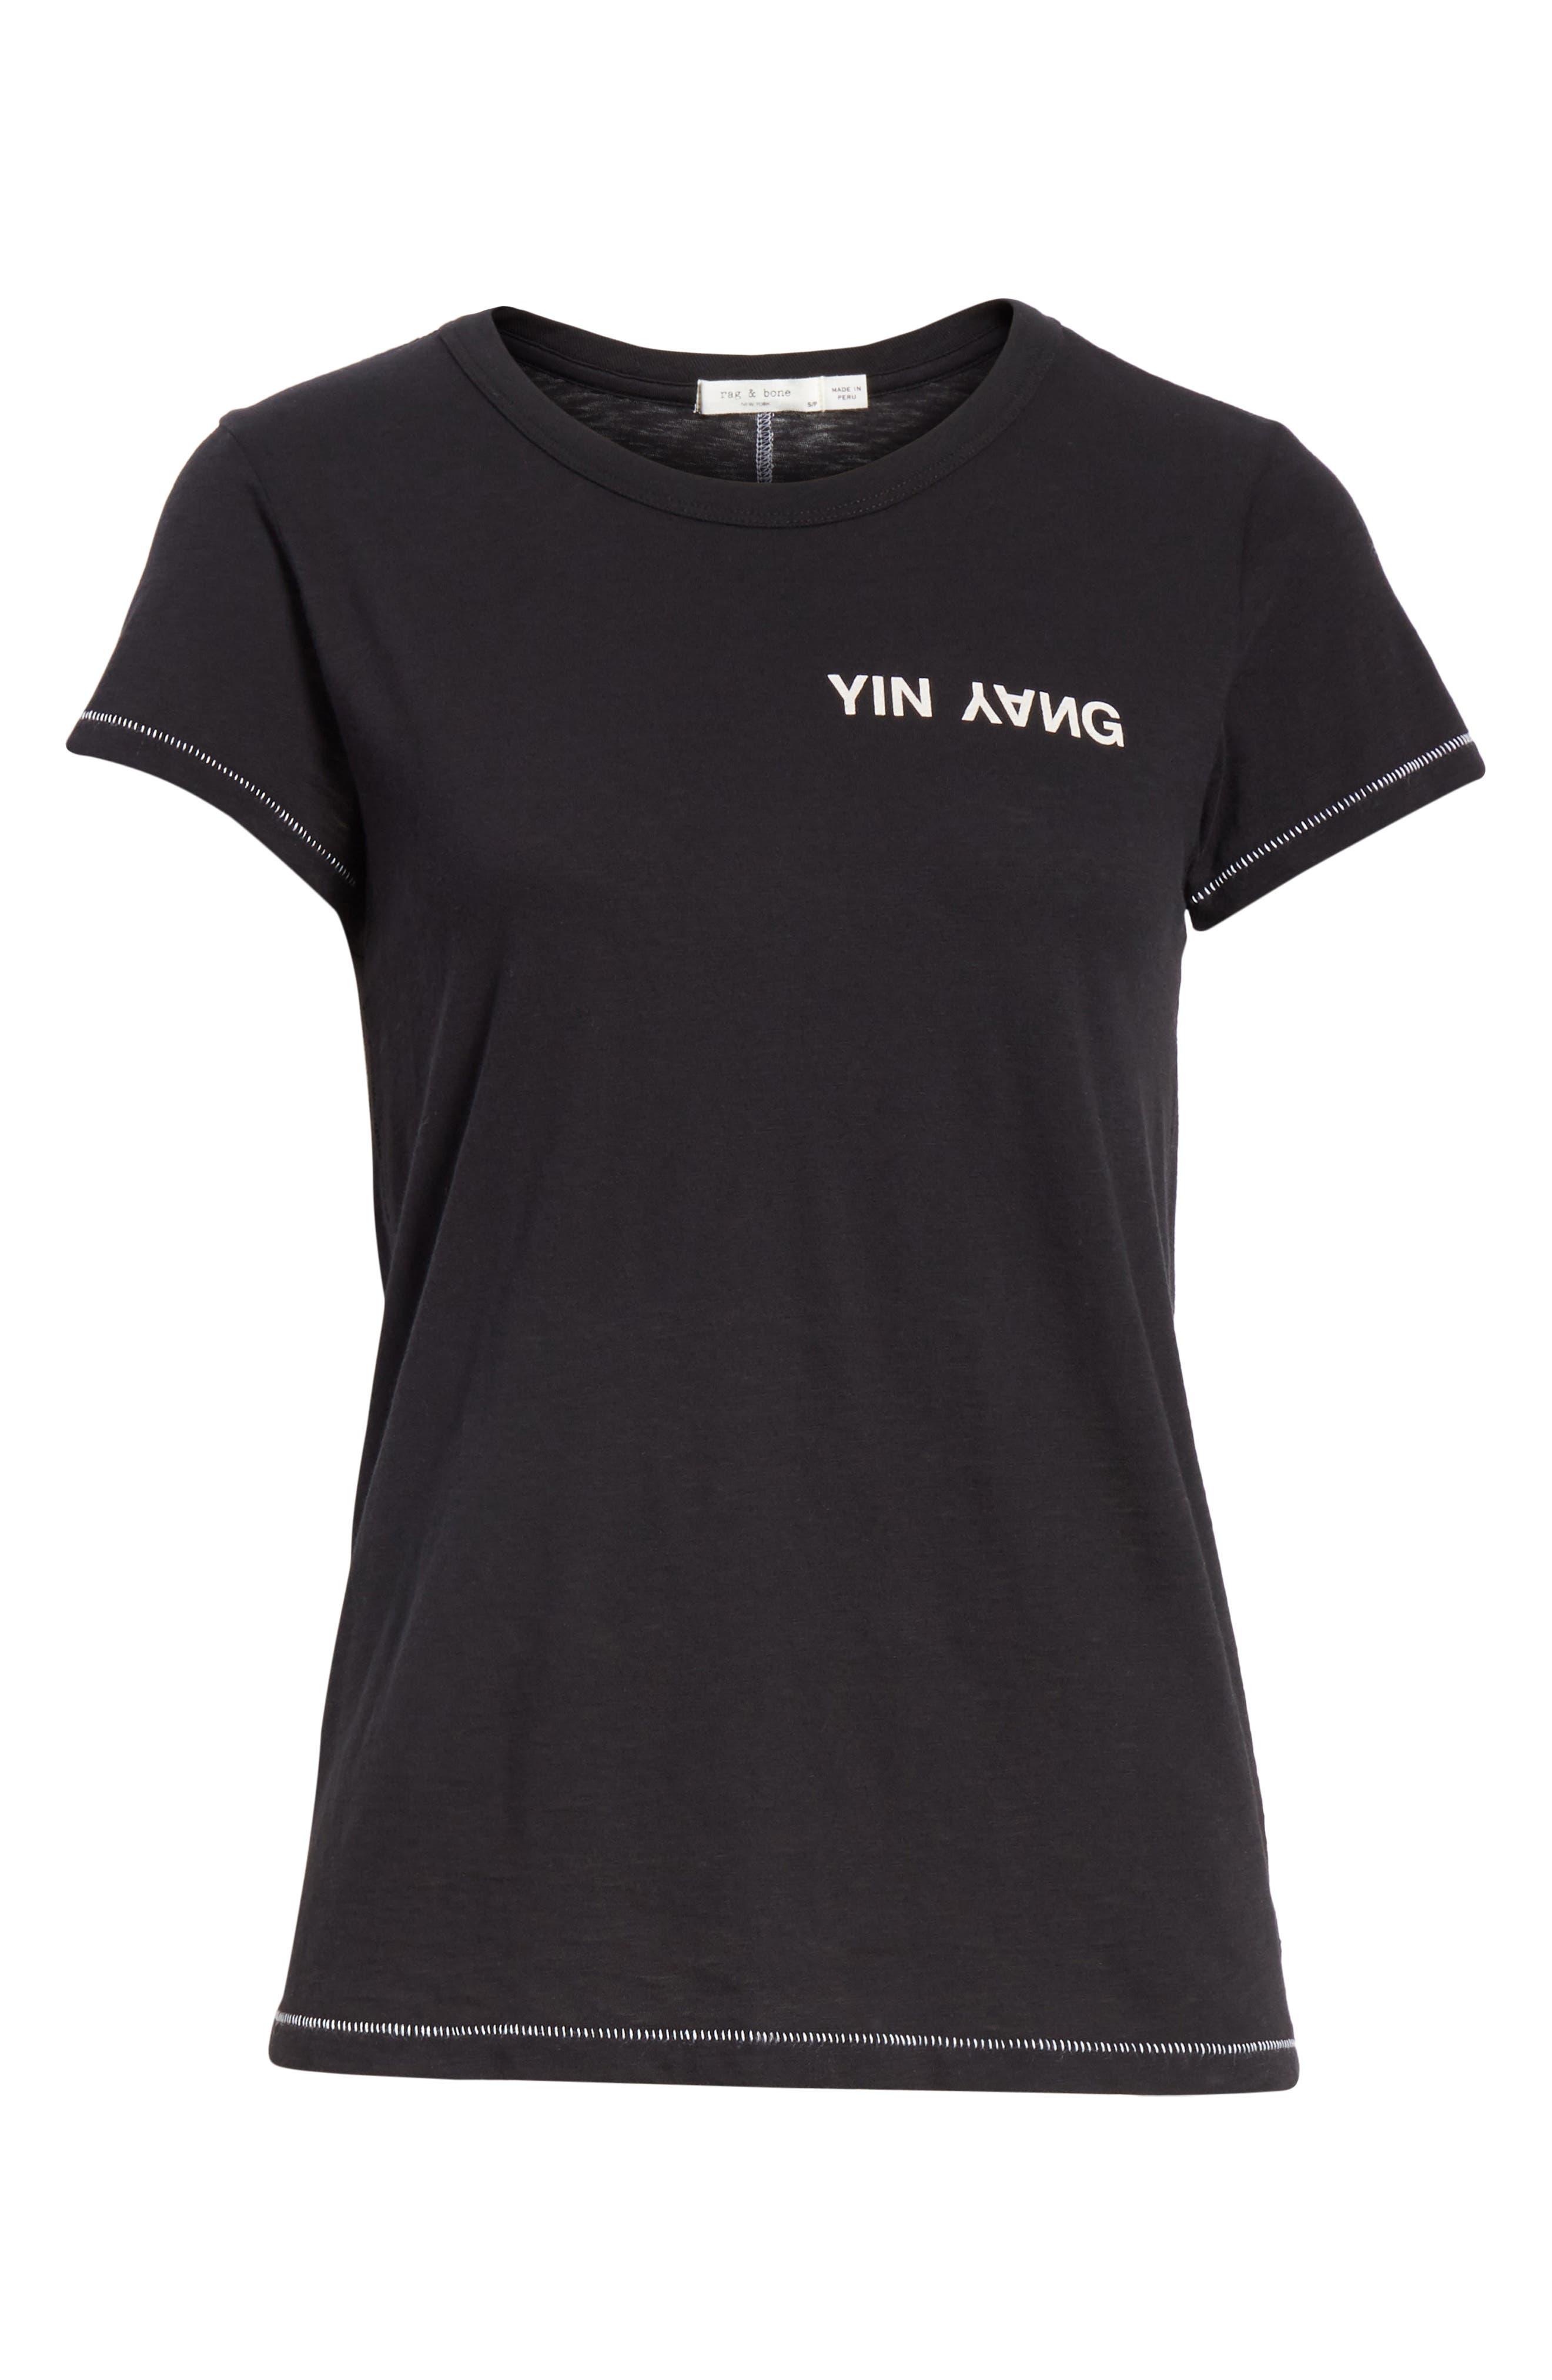 JEAN Yin Yang Tee,                             Alternate thumbnail 6, color,                             001